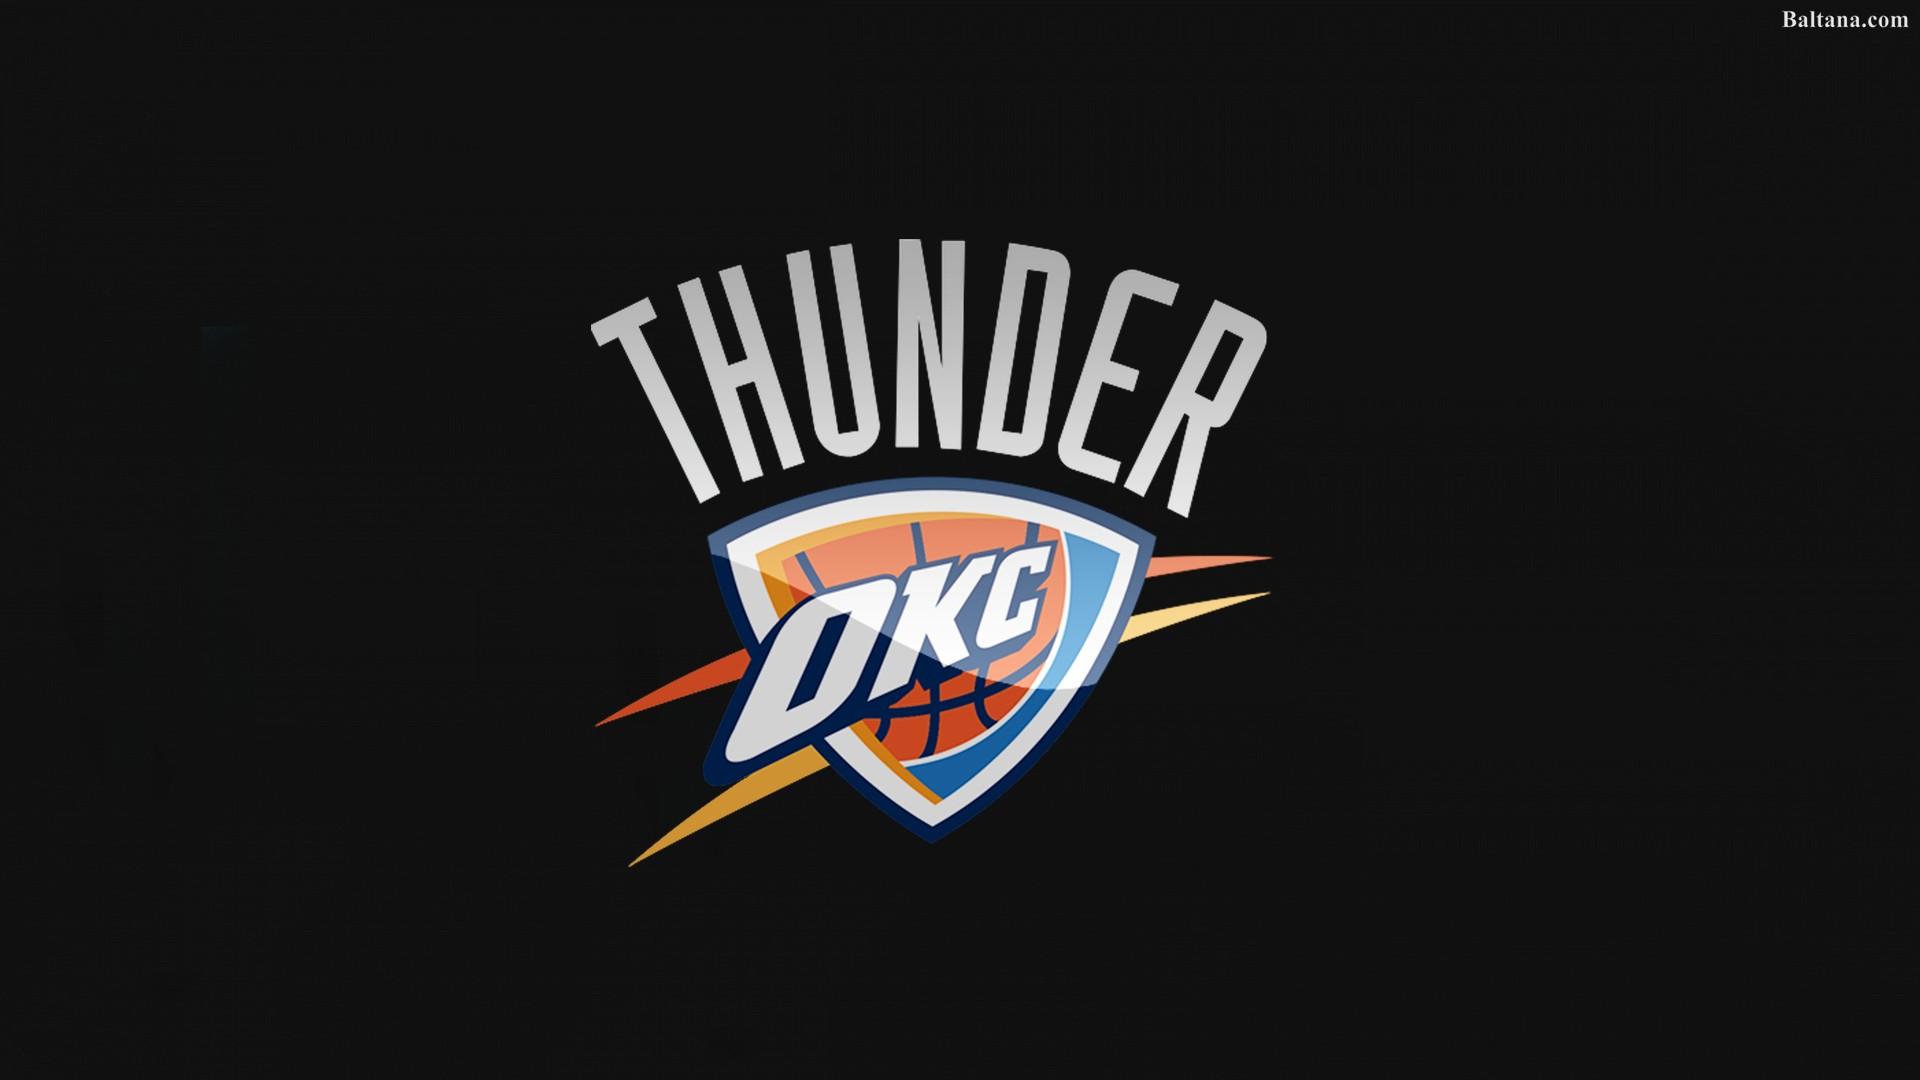 Oklahoma City Thunder HD Desktop Wallpaper 33586   Baltana 1920x1080